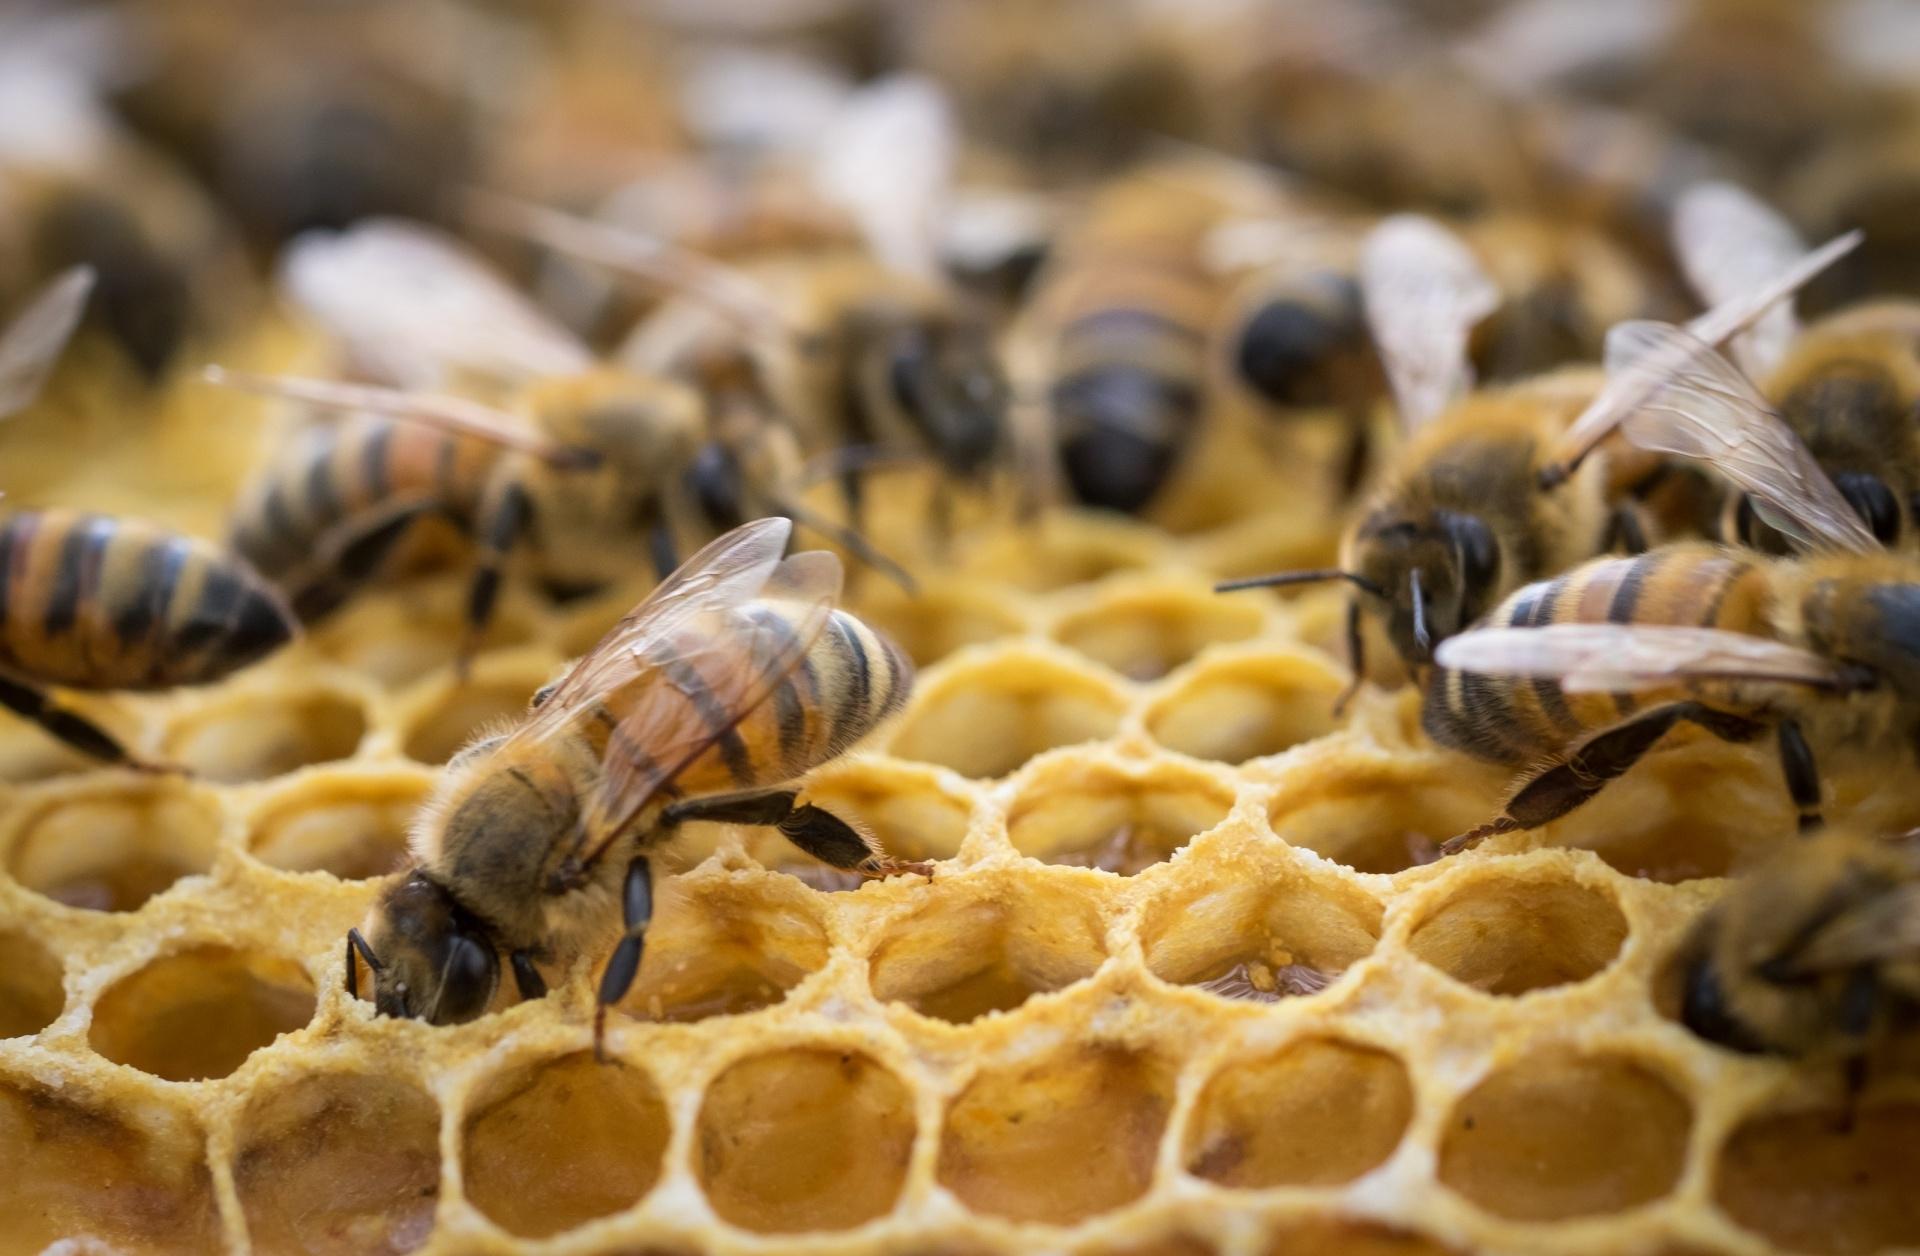 Hive Mind: discovering natural intelligence